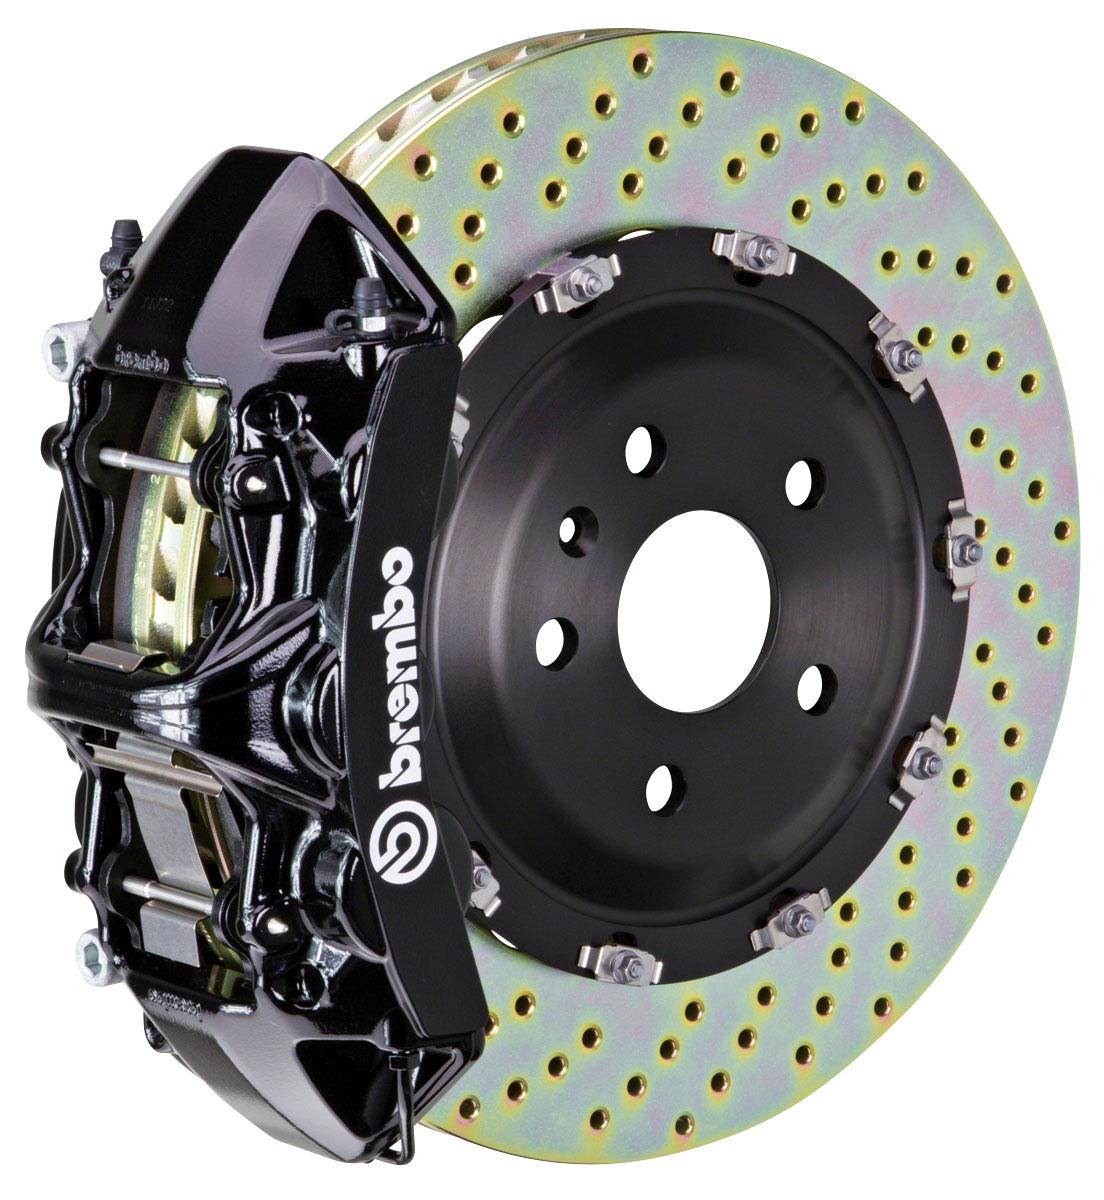 Brake Set, Brembo, 2004-09 XLR/XLR-V, Front, 2pc 380mm Rotors, 1pc 6P Calipers